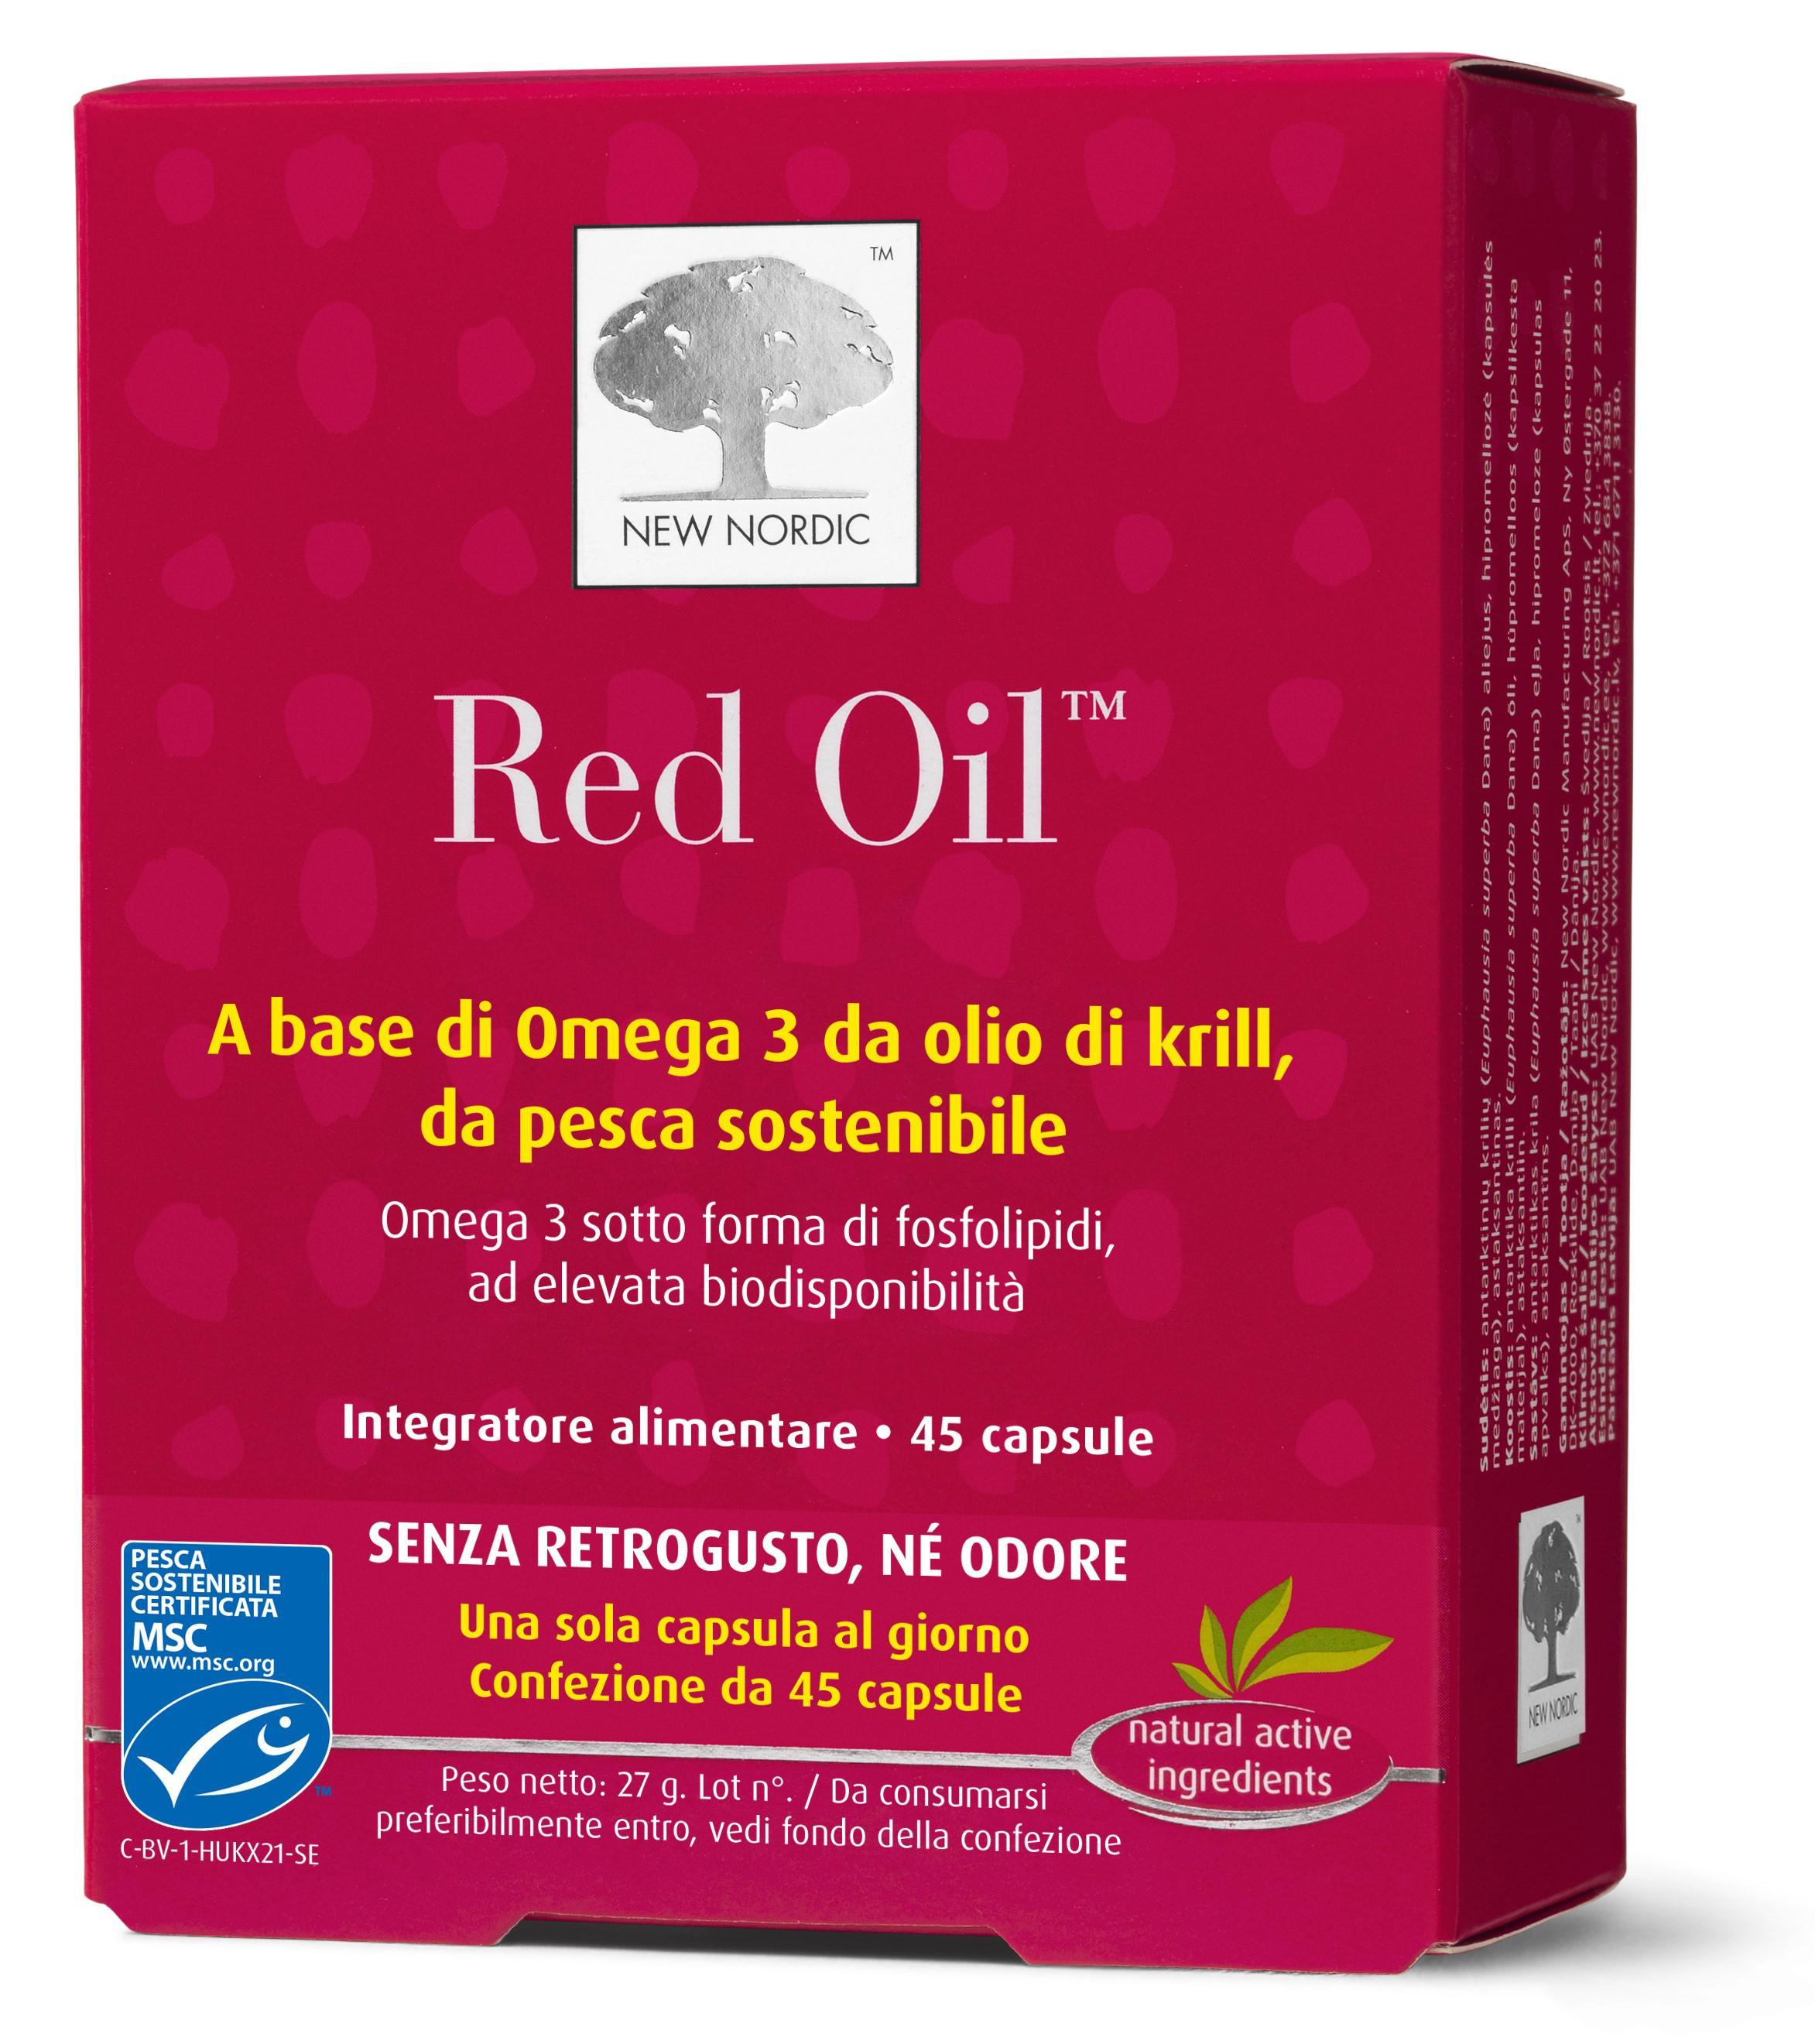 Red Oil ™ 45 / 60 capsule